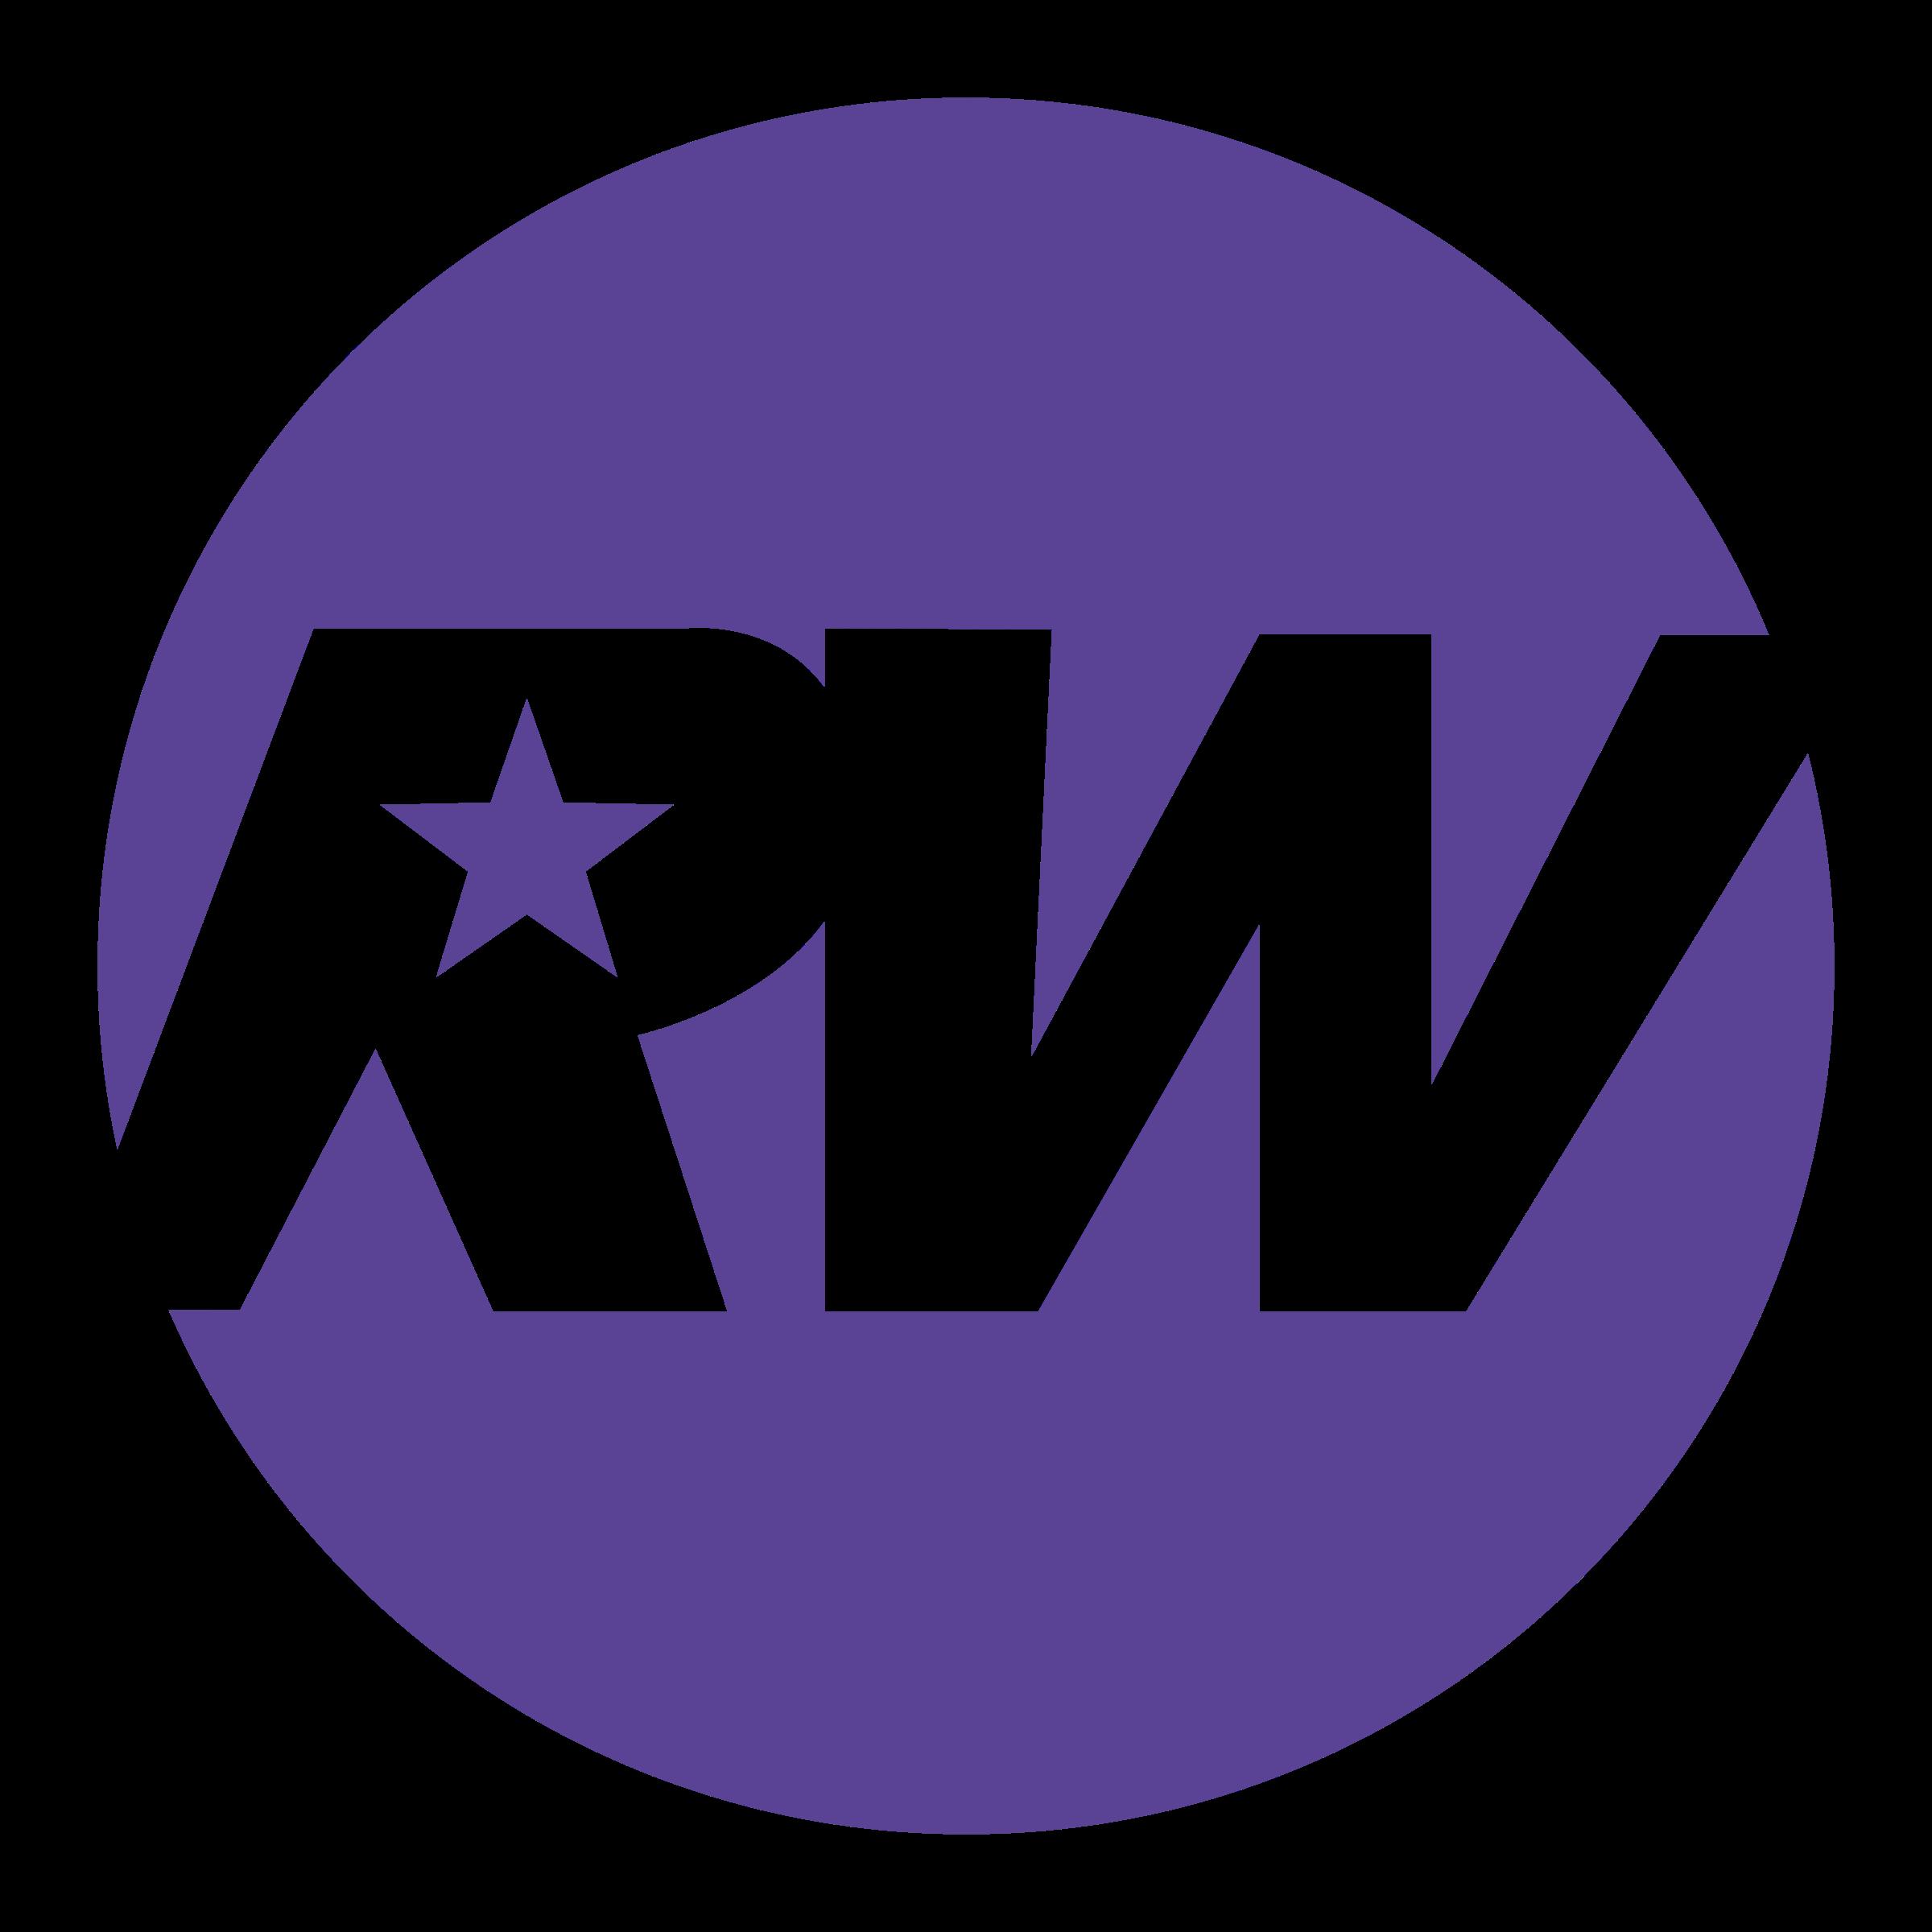 Robbie Williams Logo PNG Transparent & SVG Vector.